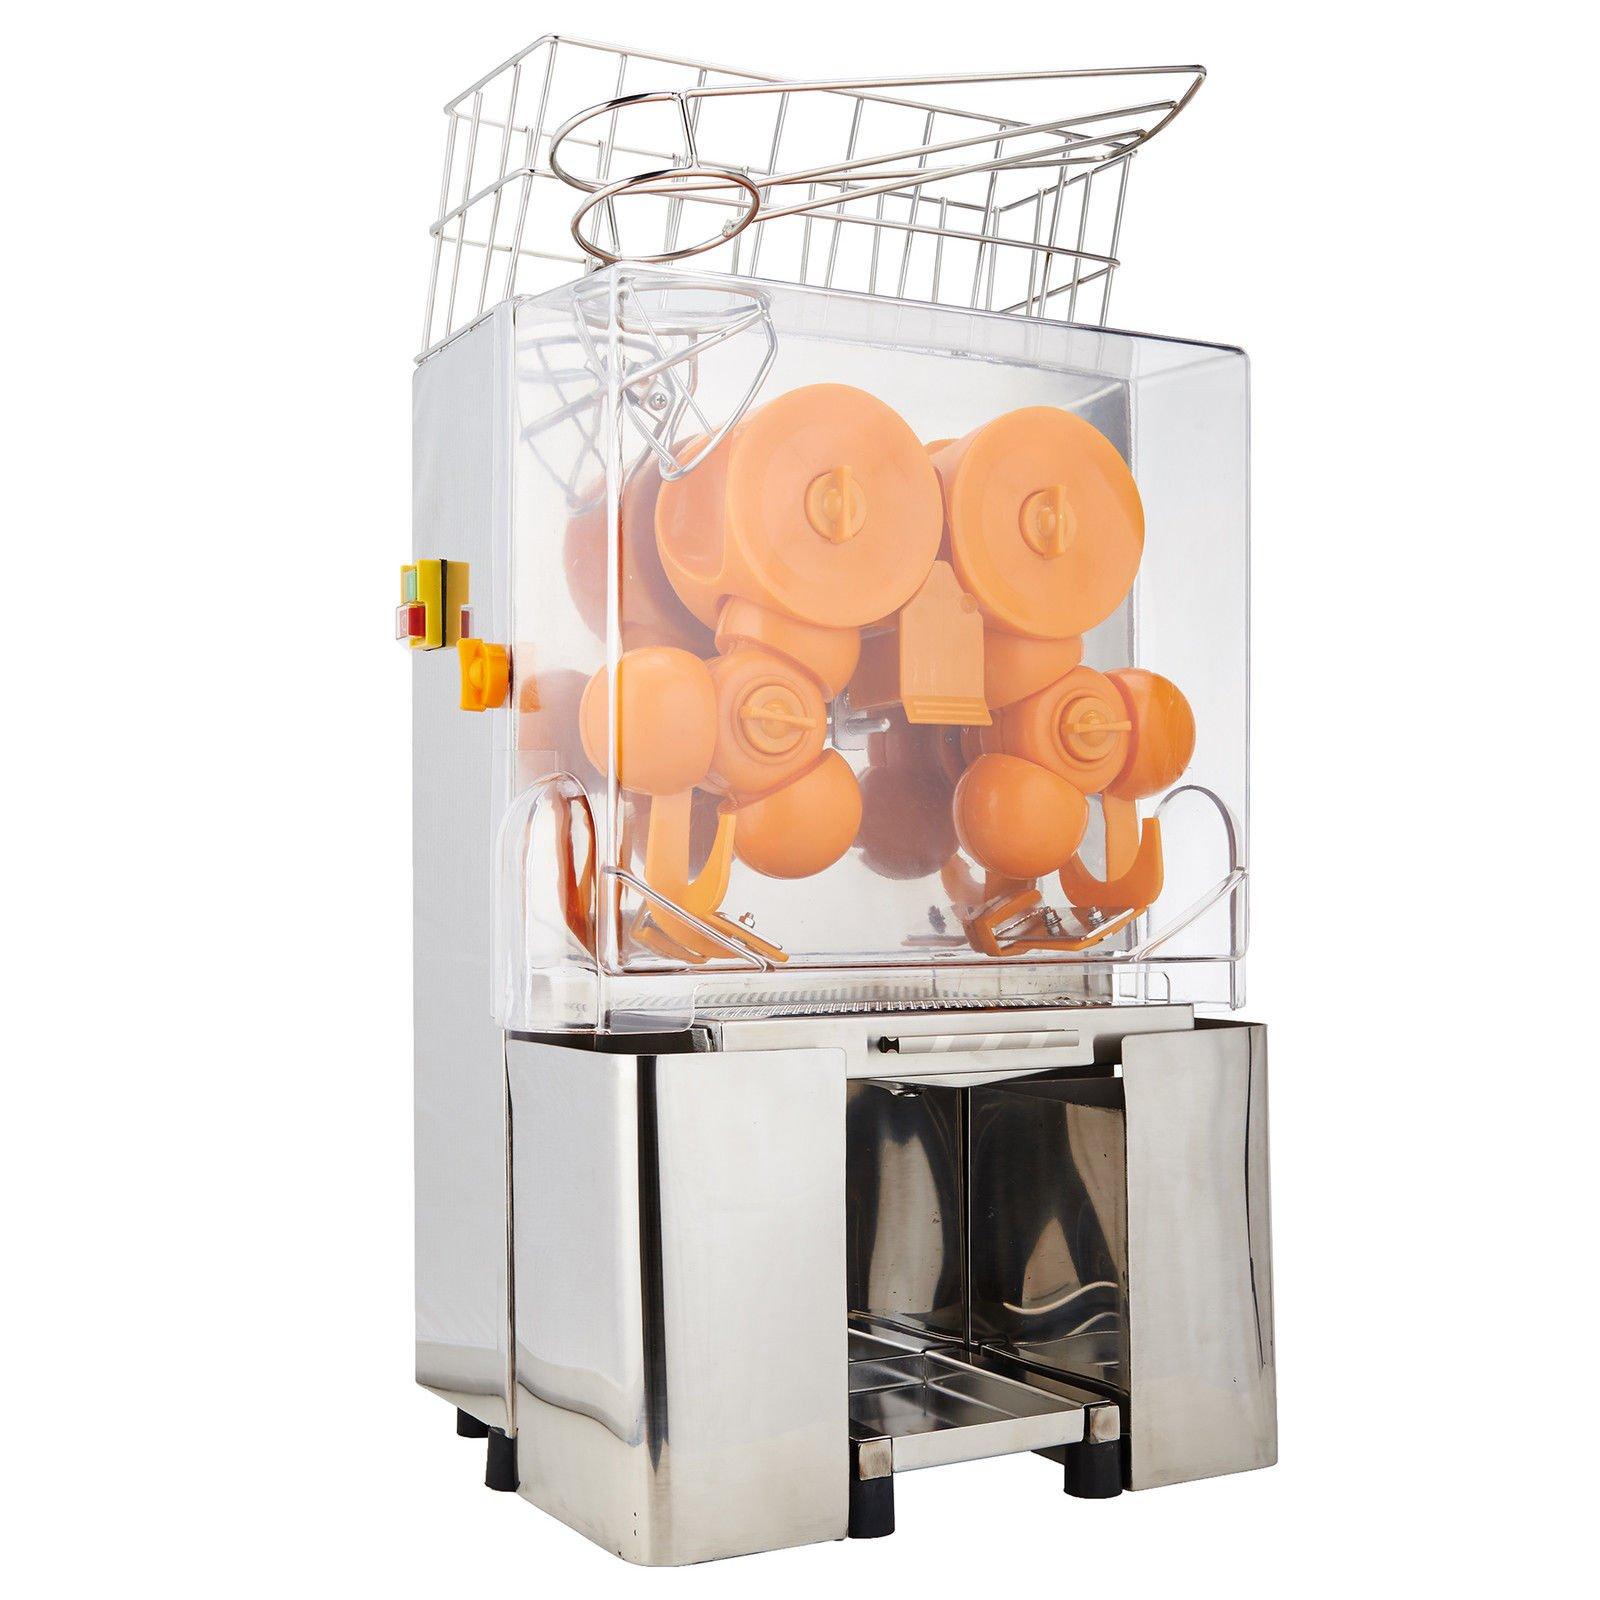 Happybuy Orange Juicer Orange Squeezer Machine Citrus Juicer Electric Fruit Juicer Machine Citrus Lemon Lime Automatic Auto Feed Commercial (Stainless Steel tank) by Happybuy (Image #2)